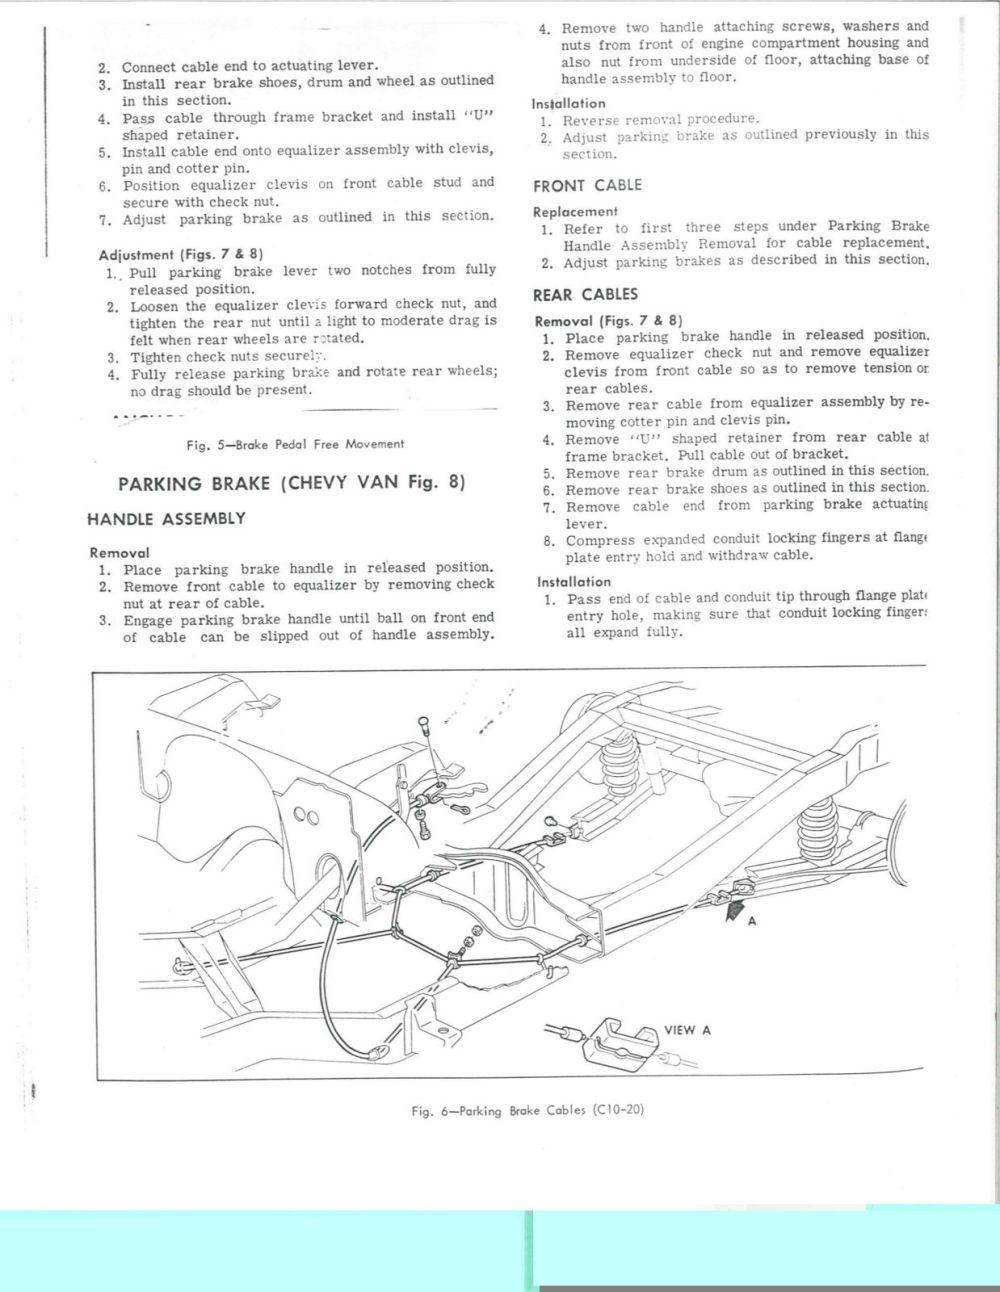 medium resolution of 1966 1972 chevy truck parking brake system